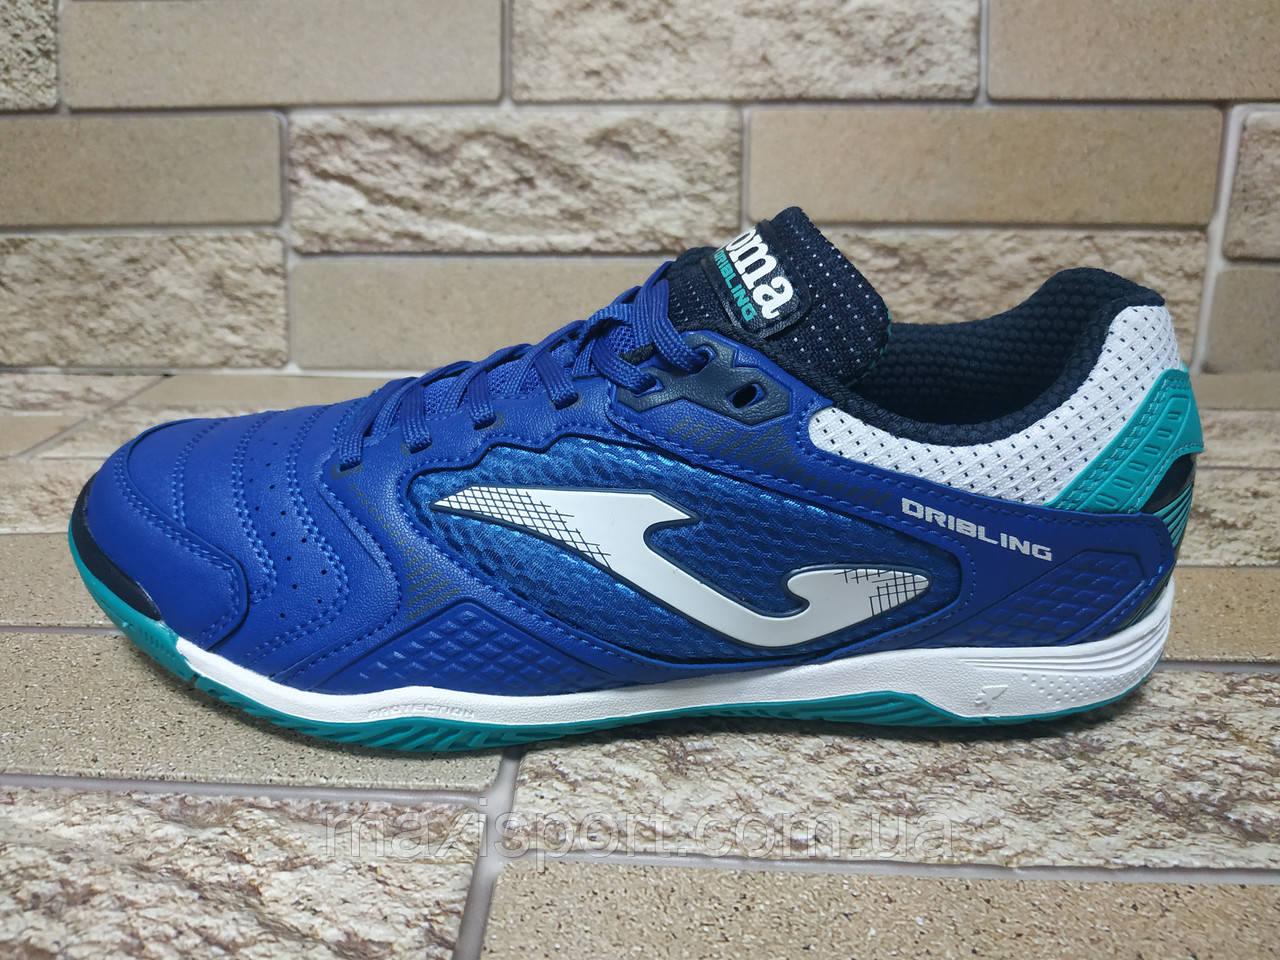 Обувь для зала (DRIW.2004 IN)